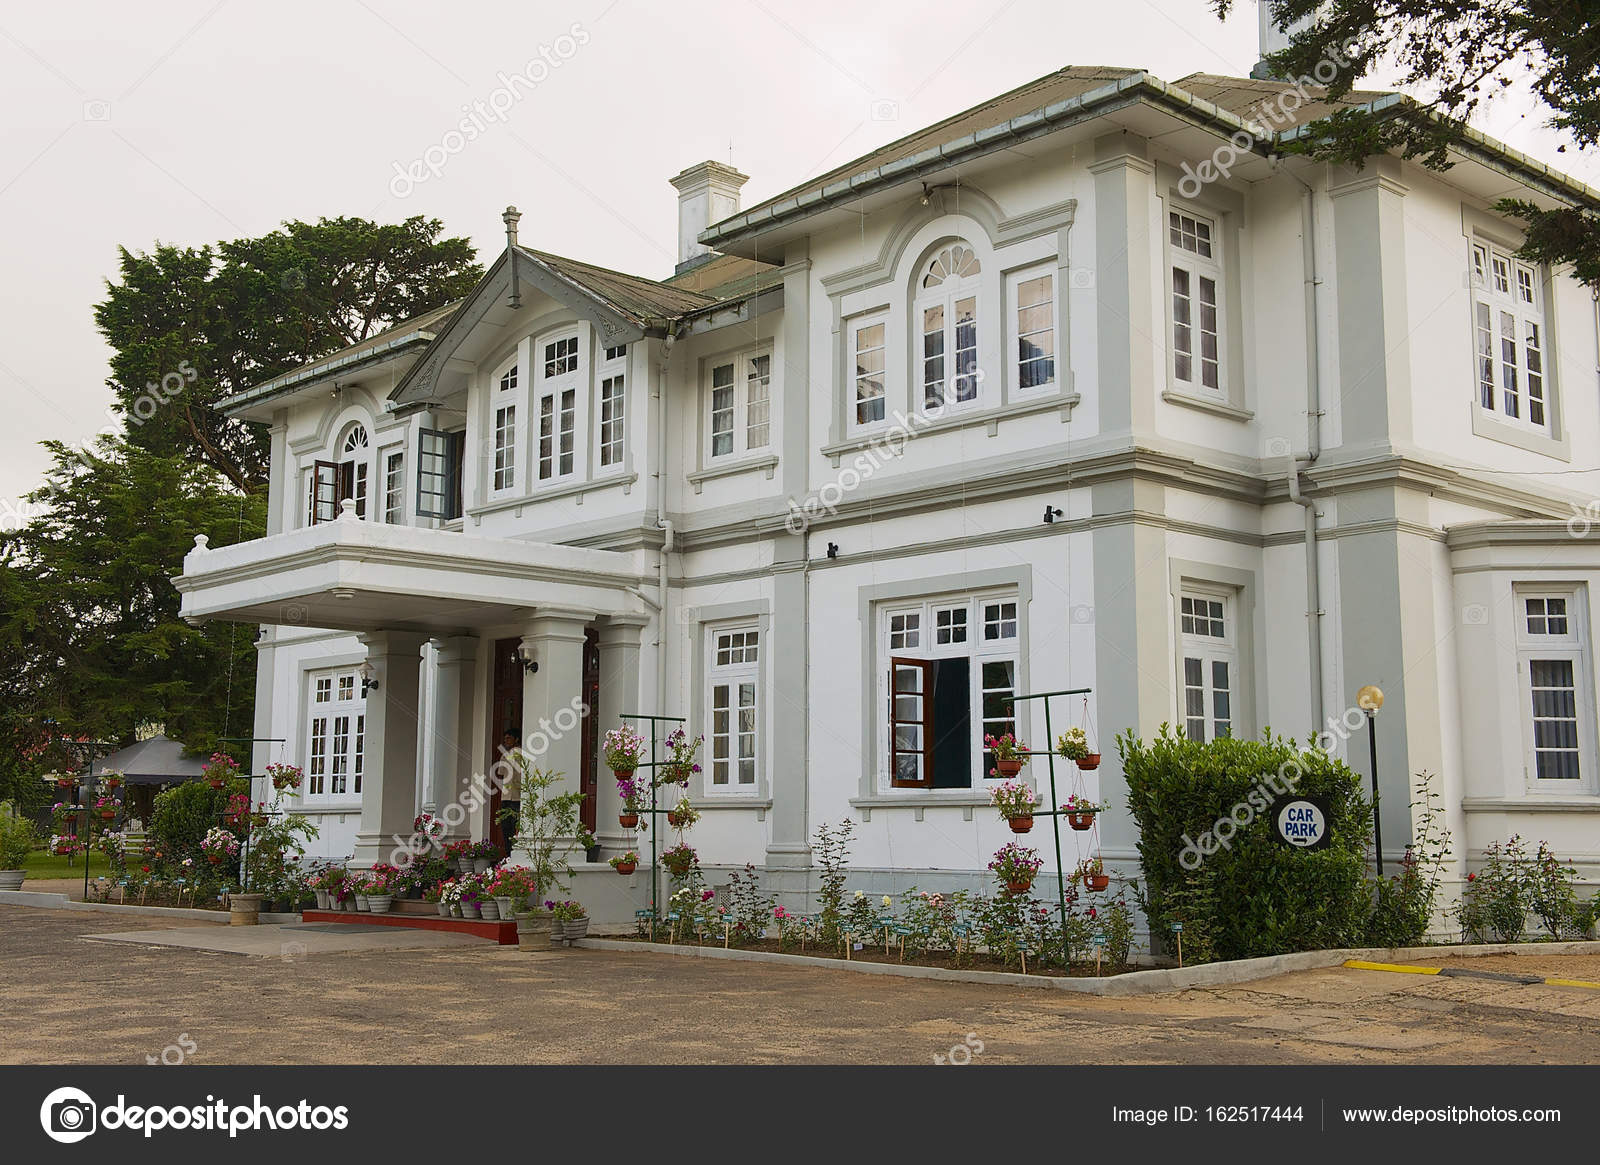 Colonial Architecture Building In Nuwara Eliya Sri Lanka Stock